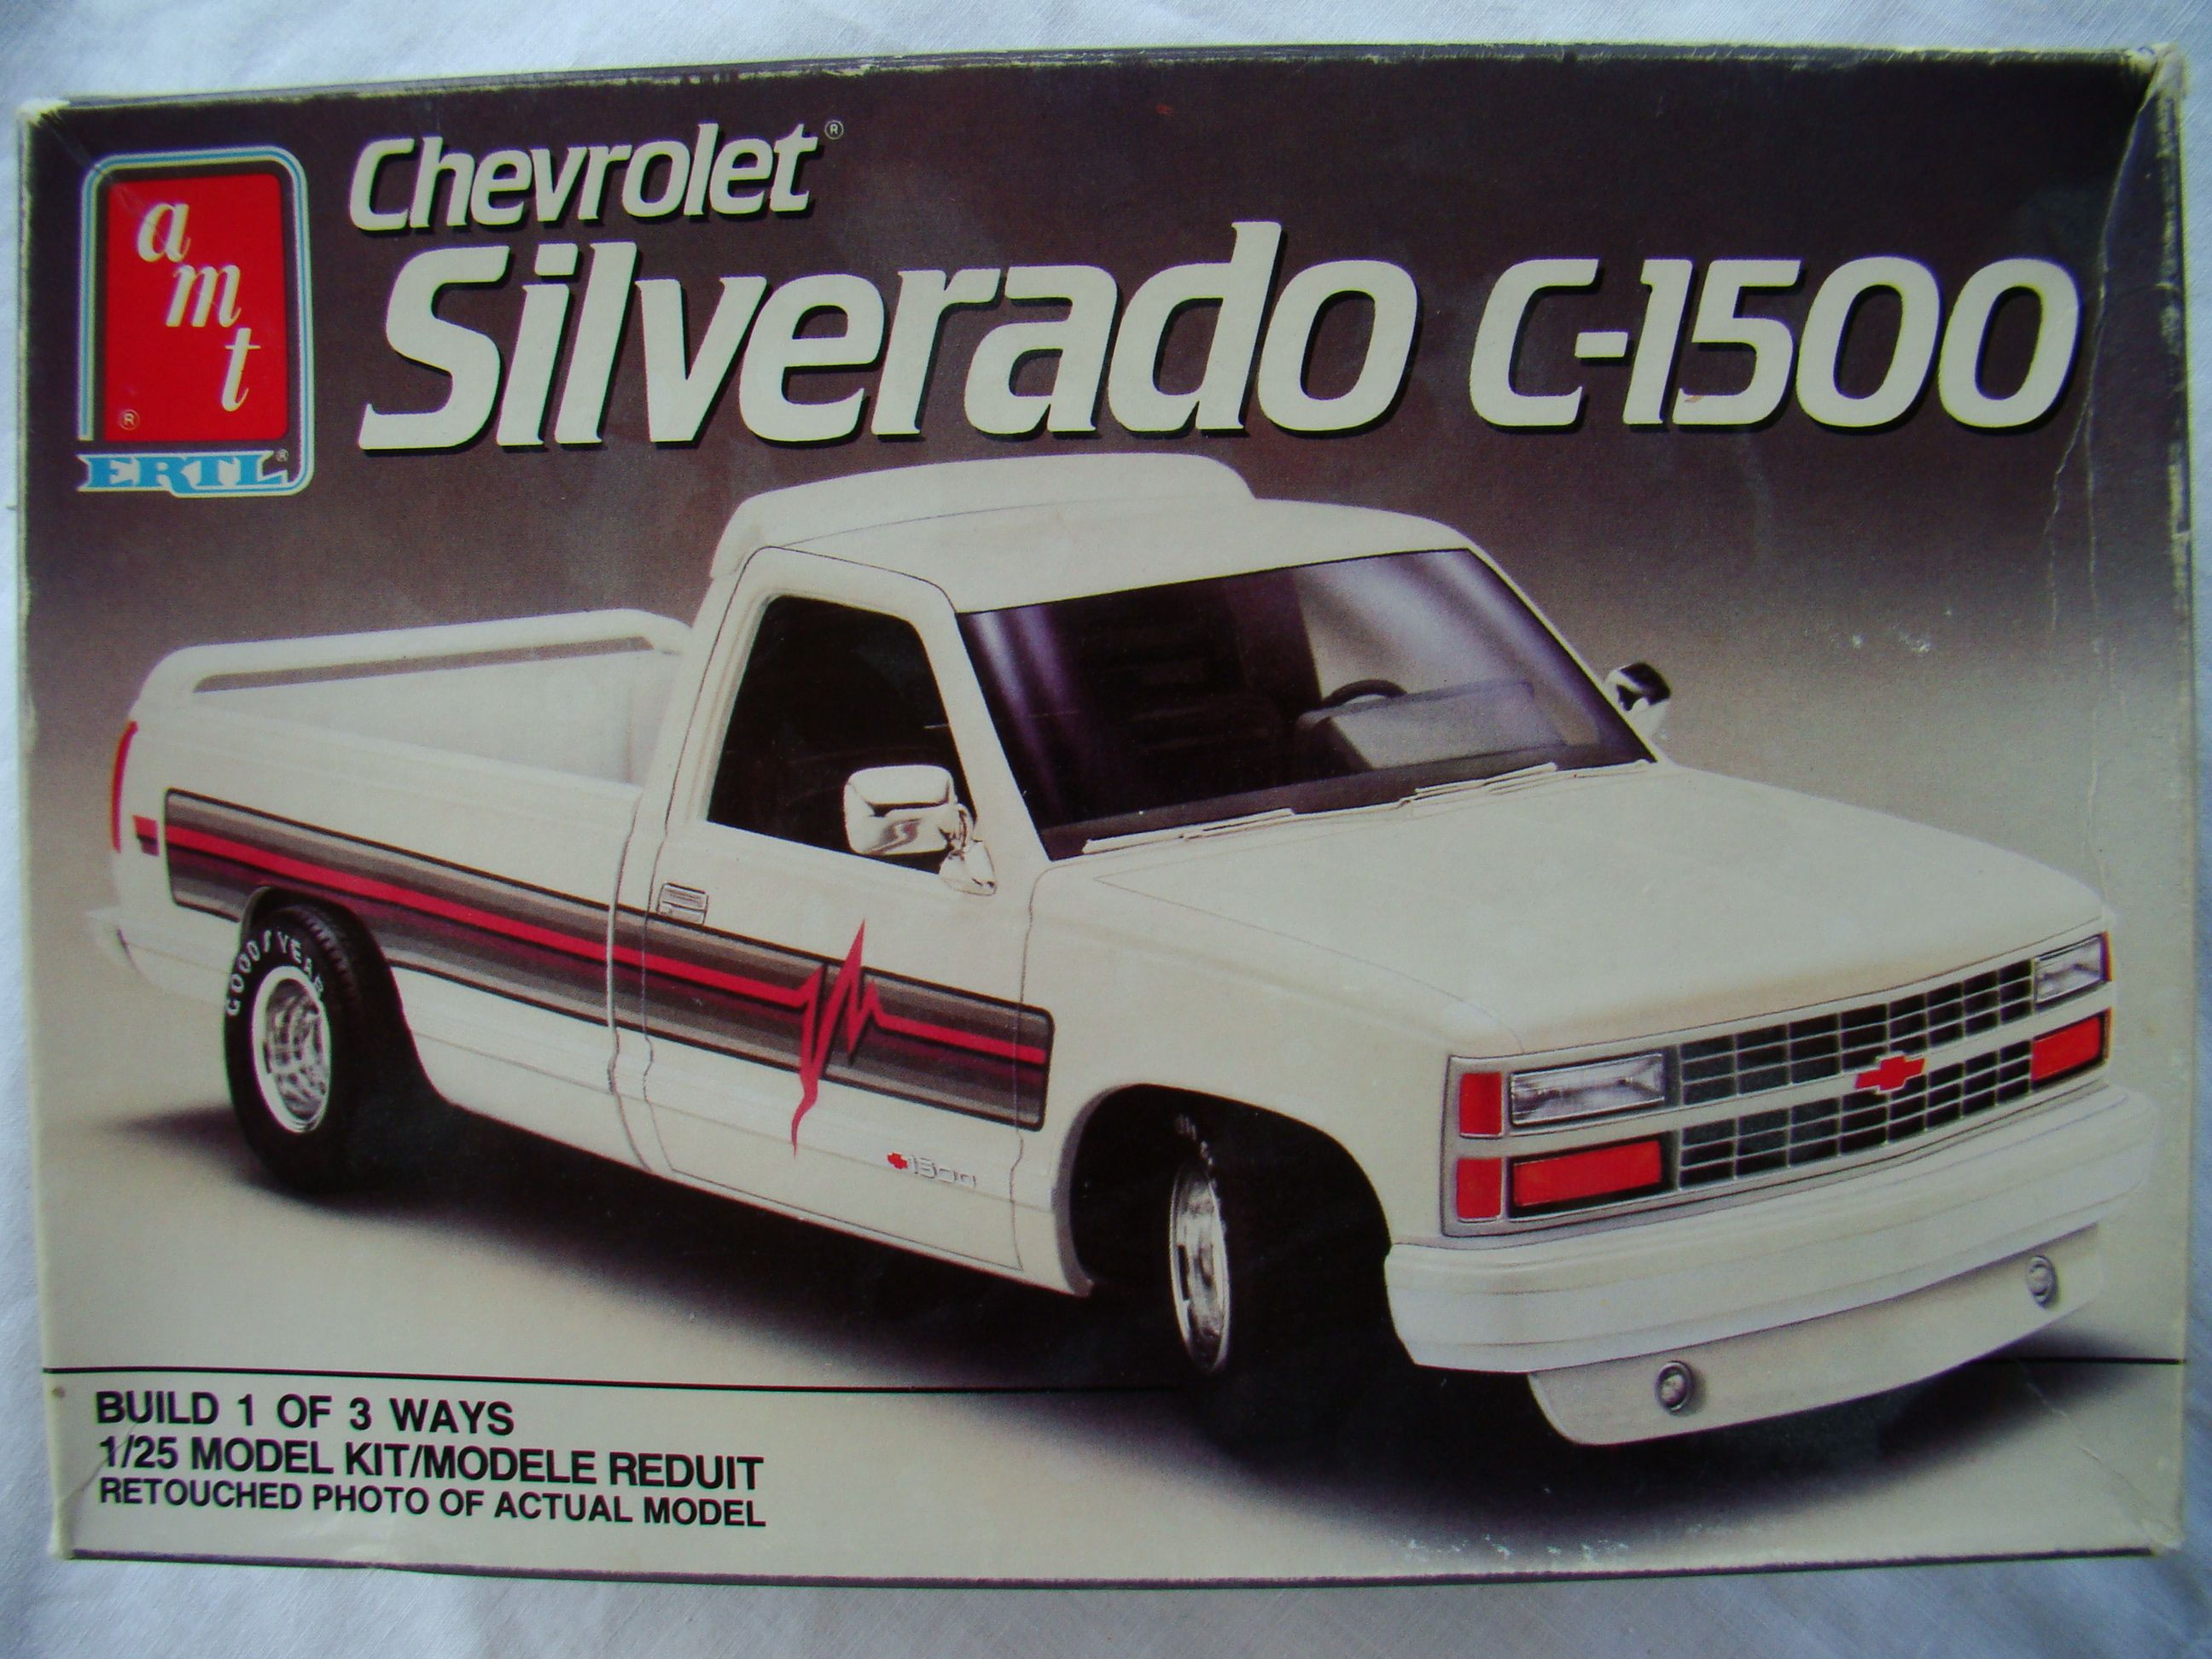 small resolution of amt 90 chevy silverado c 1500 2in1 6069